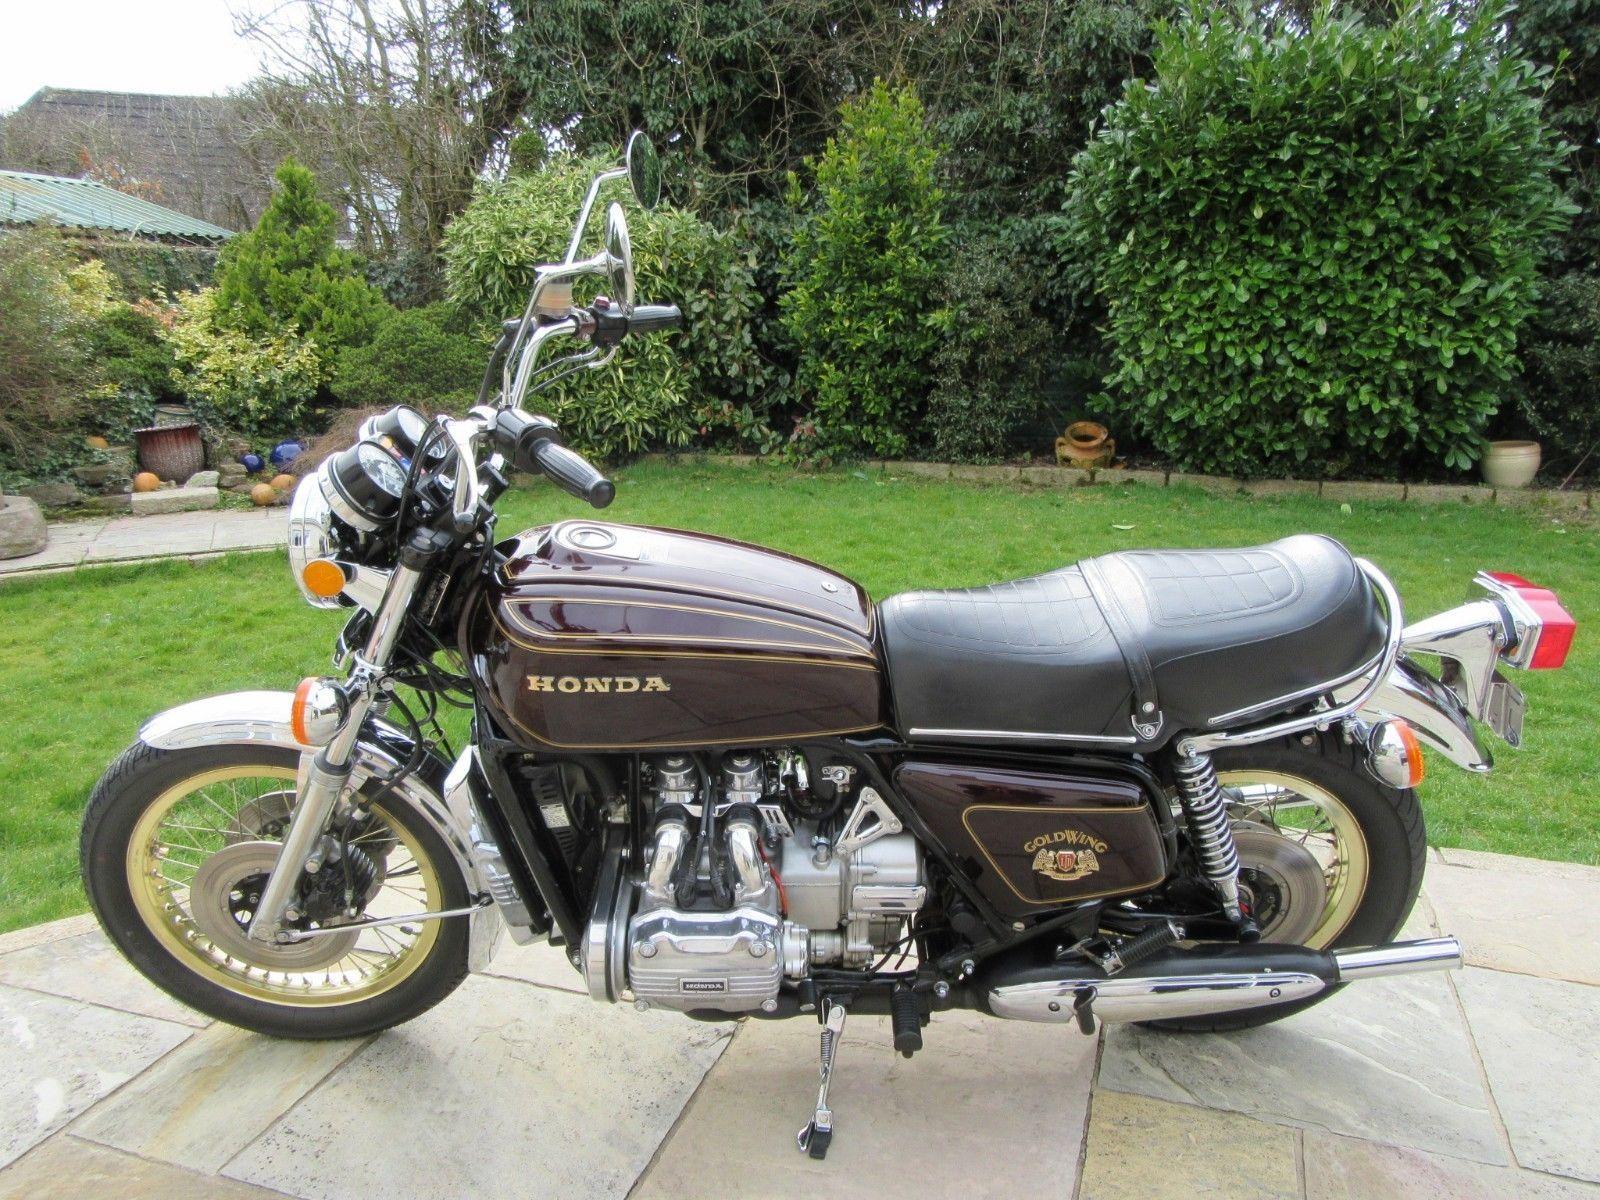 Ebay 1976 Honda Gold Wing Gl1000 Ltd Honda Goldwing Motorcycles Japanese Motorcycle